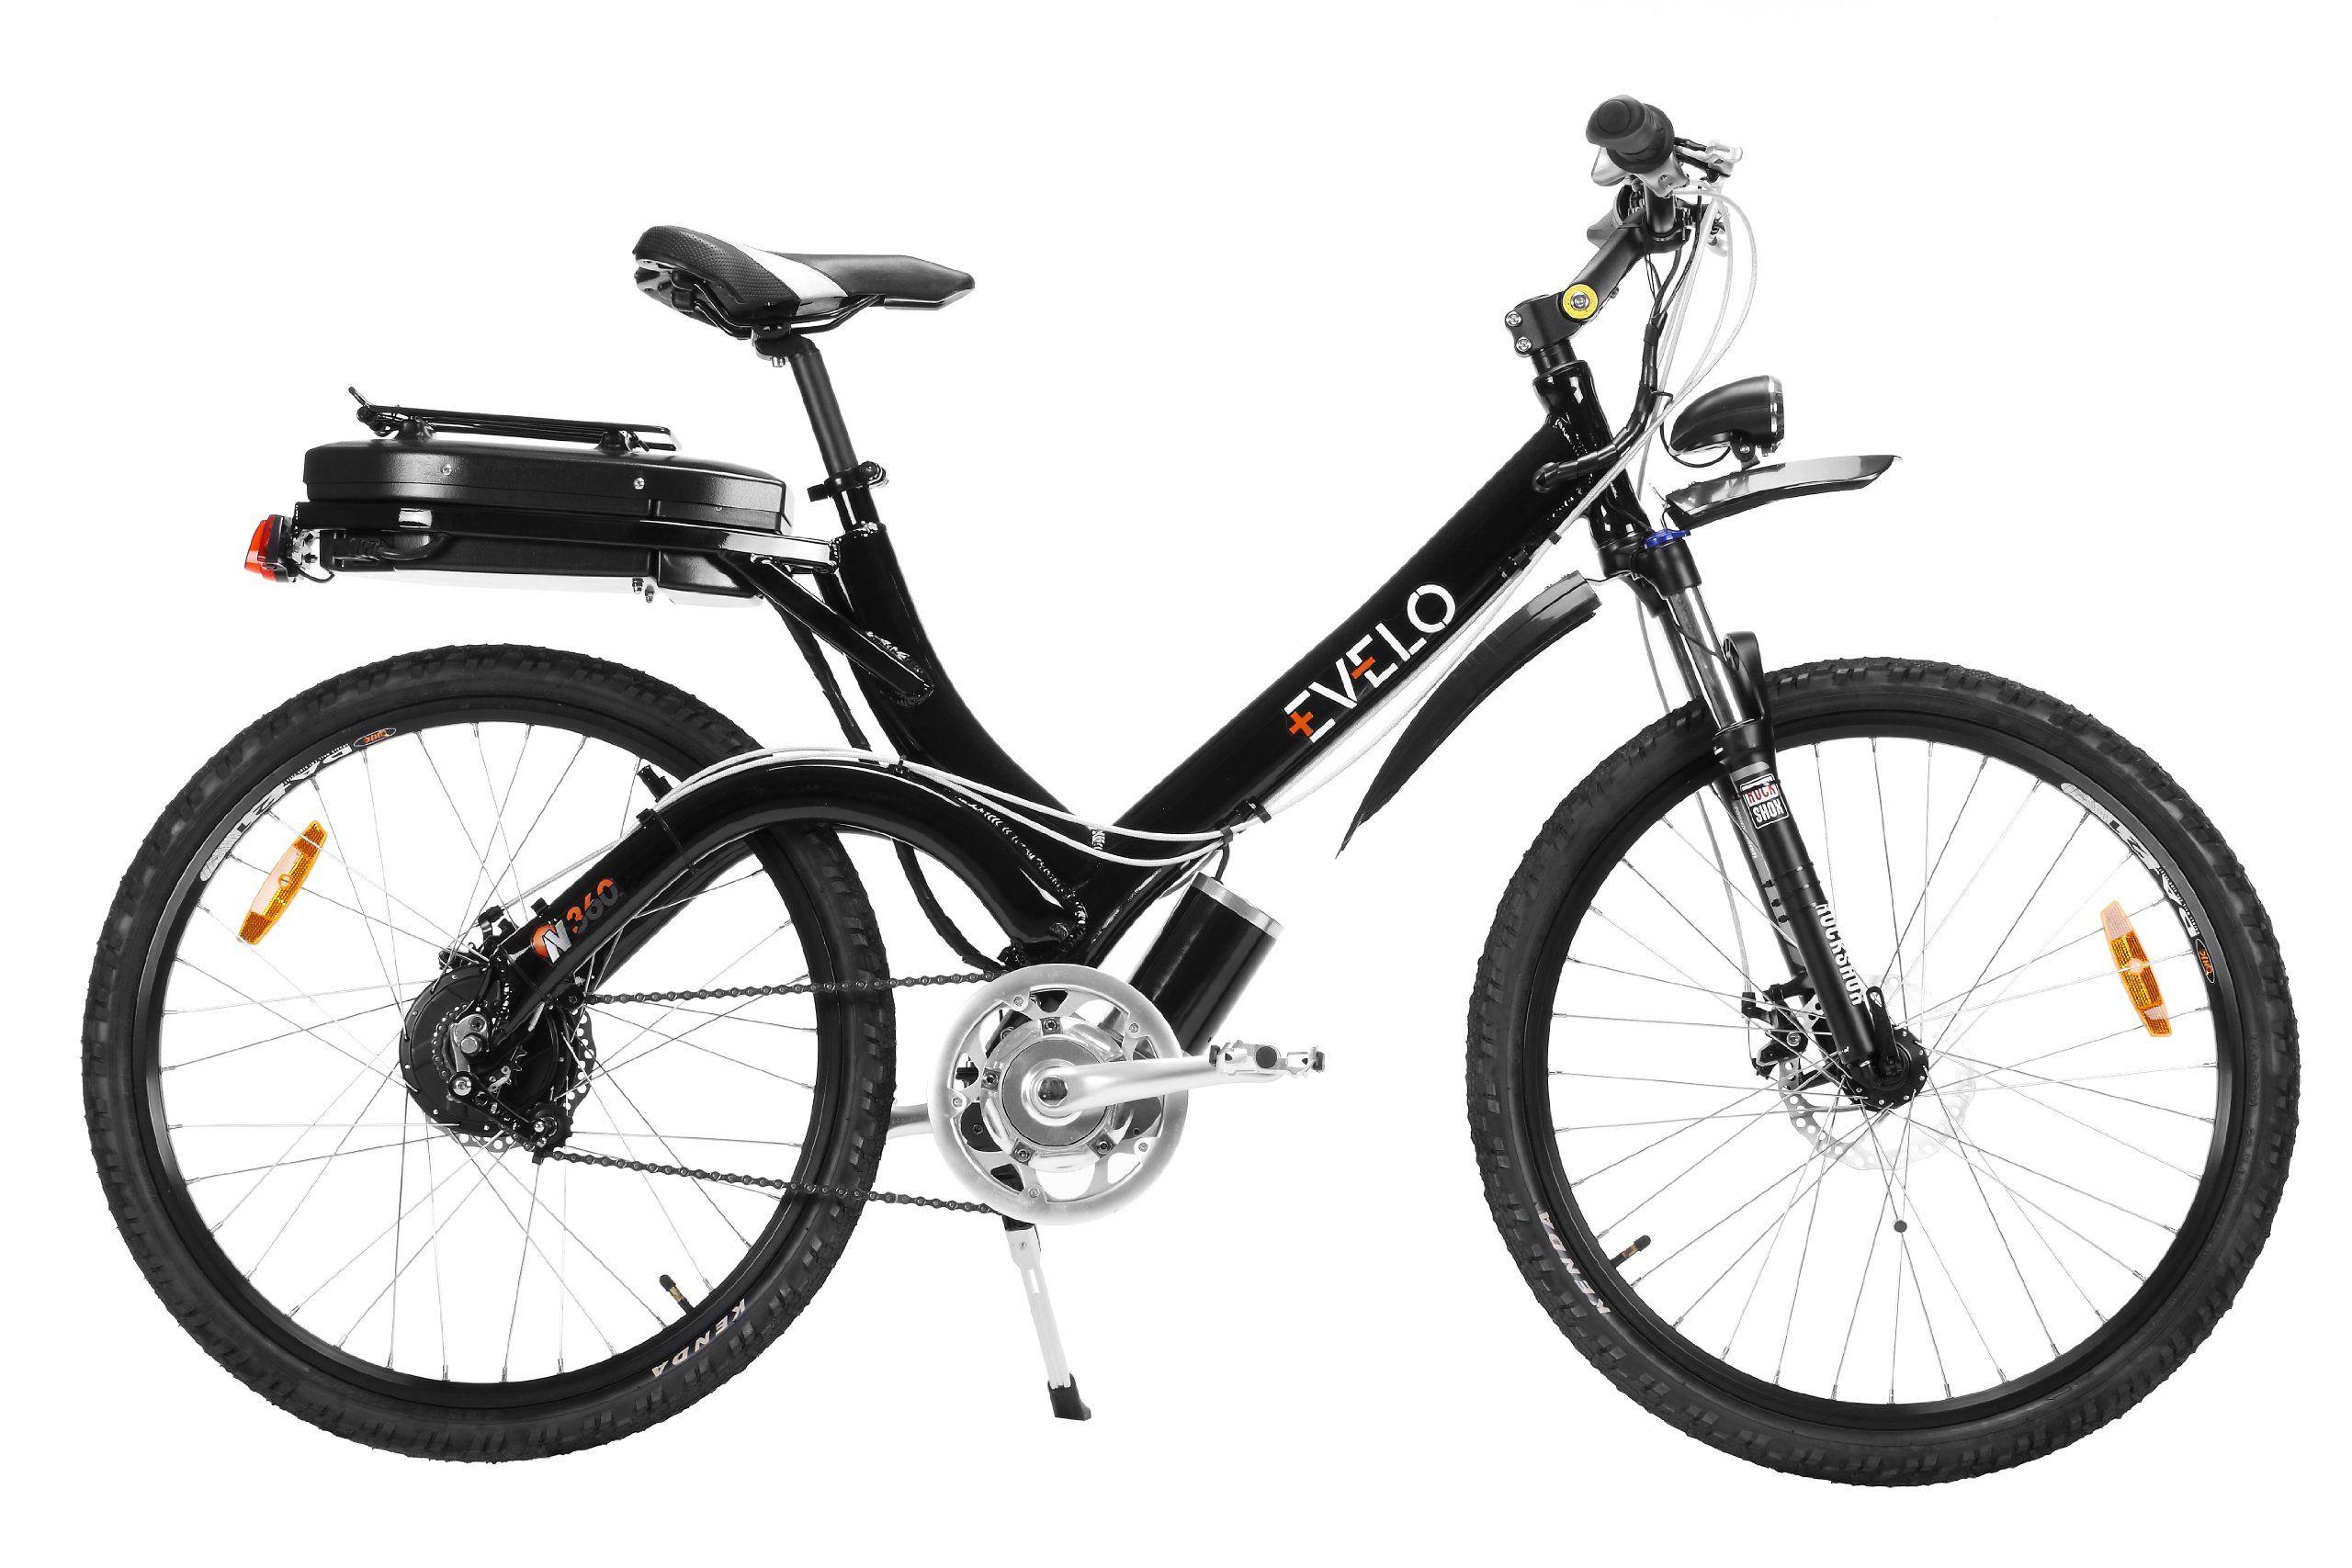 Evelo Aurora Electric Bike With Shimano Alivio 8 Speed